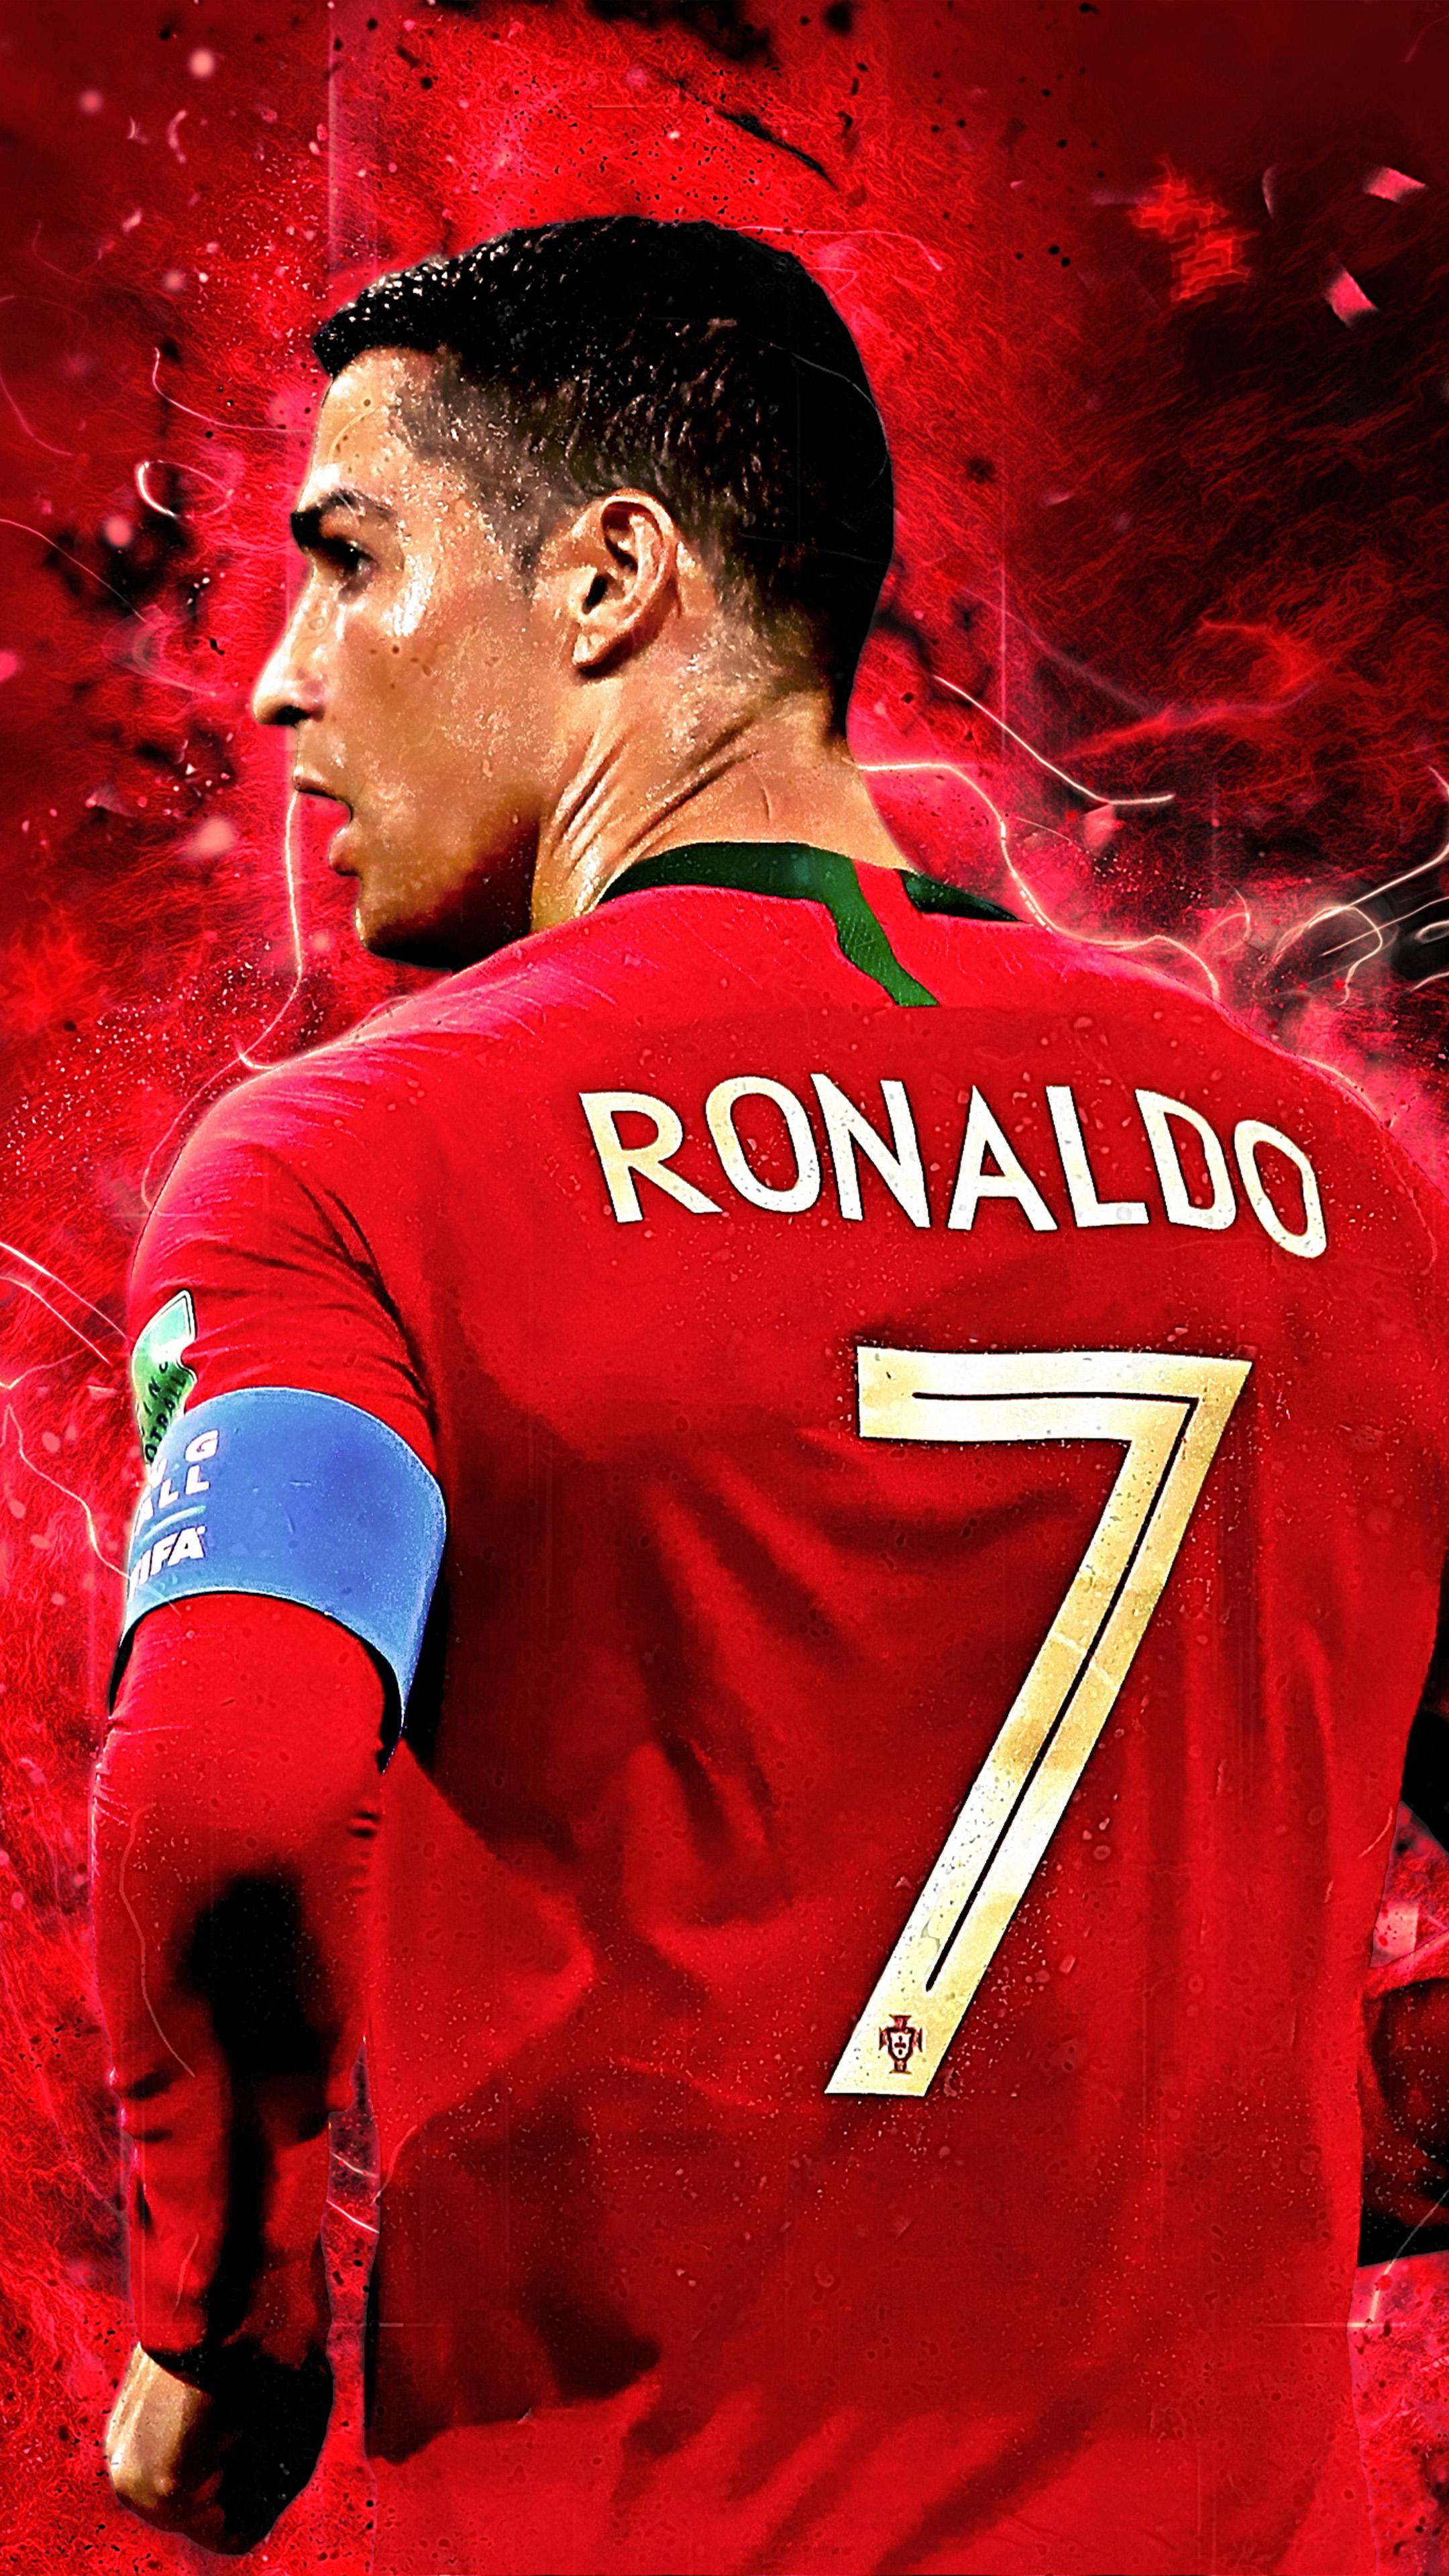 Cristiano Ronaldo Jersey Number 7 Free 4k Ultra Hd Mobile Wallpaper